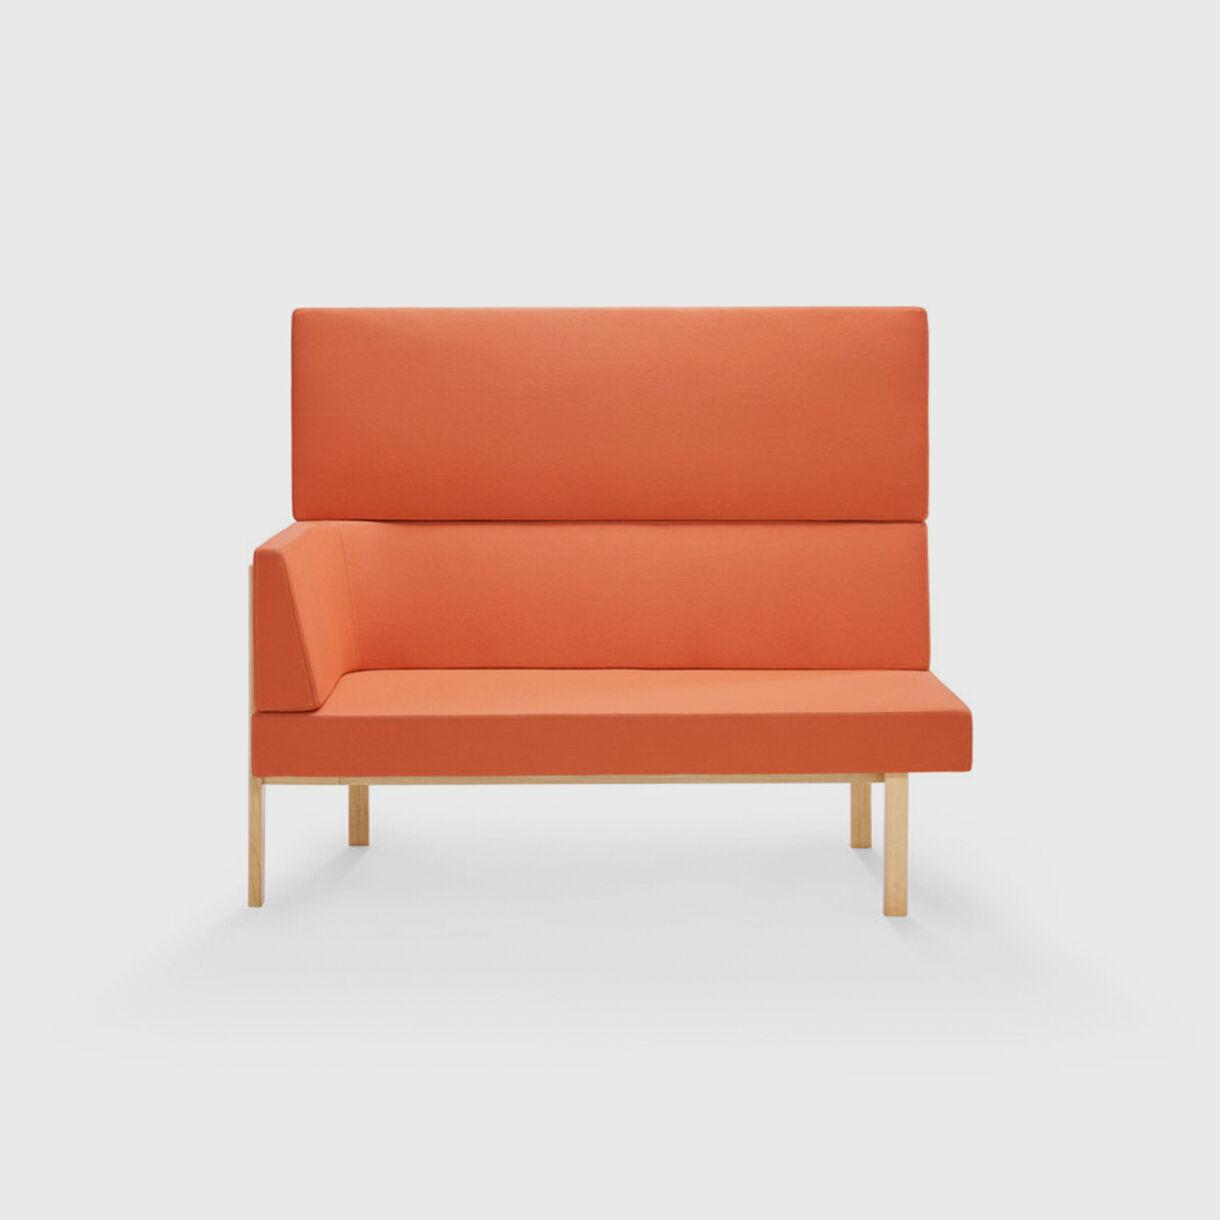 Homework Highback Chaise Lounge, Orange